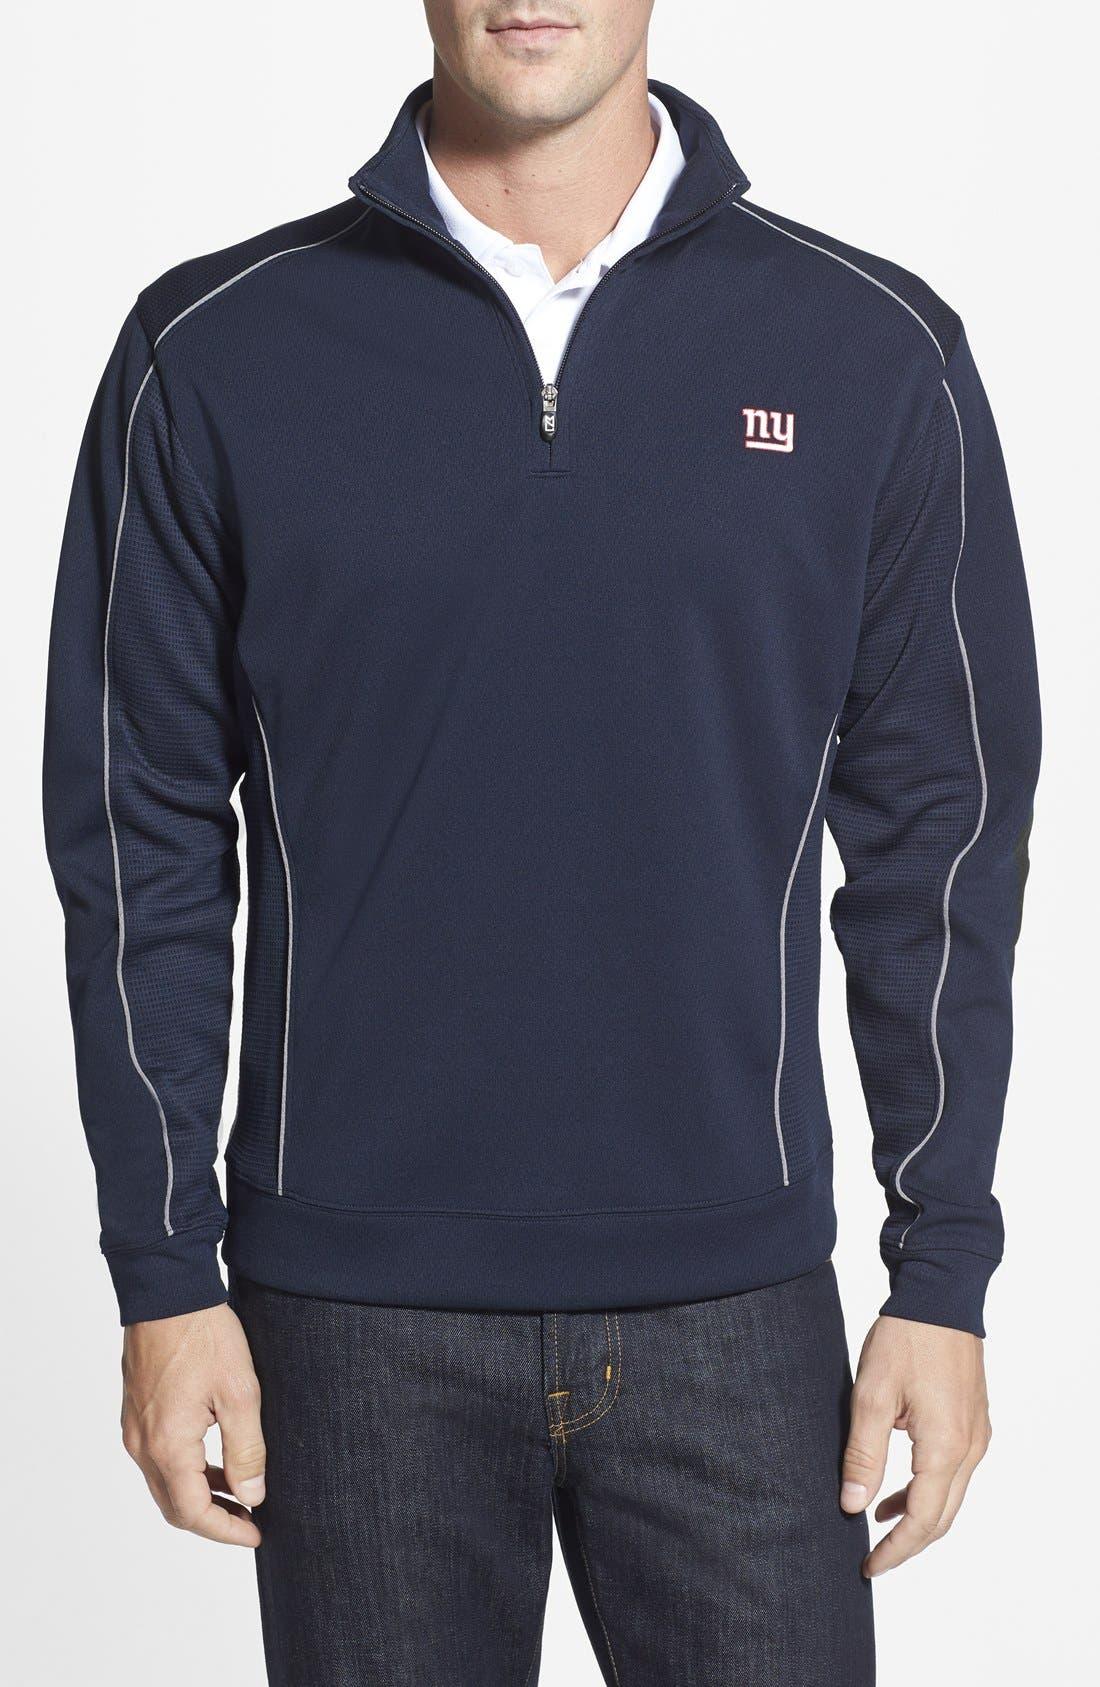 Main Image - Cutter & Buck New York Giants - Edge DryTec Moisture Wicking Half Zip Pullover